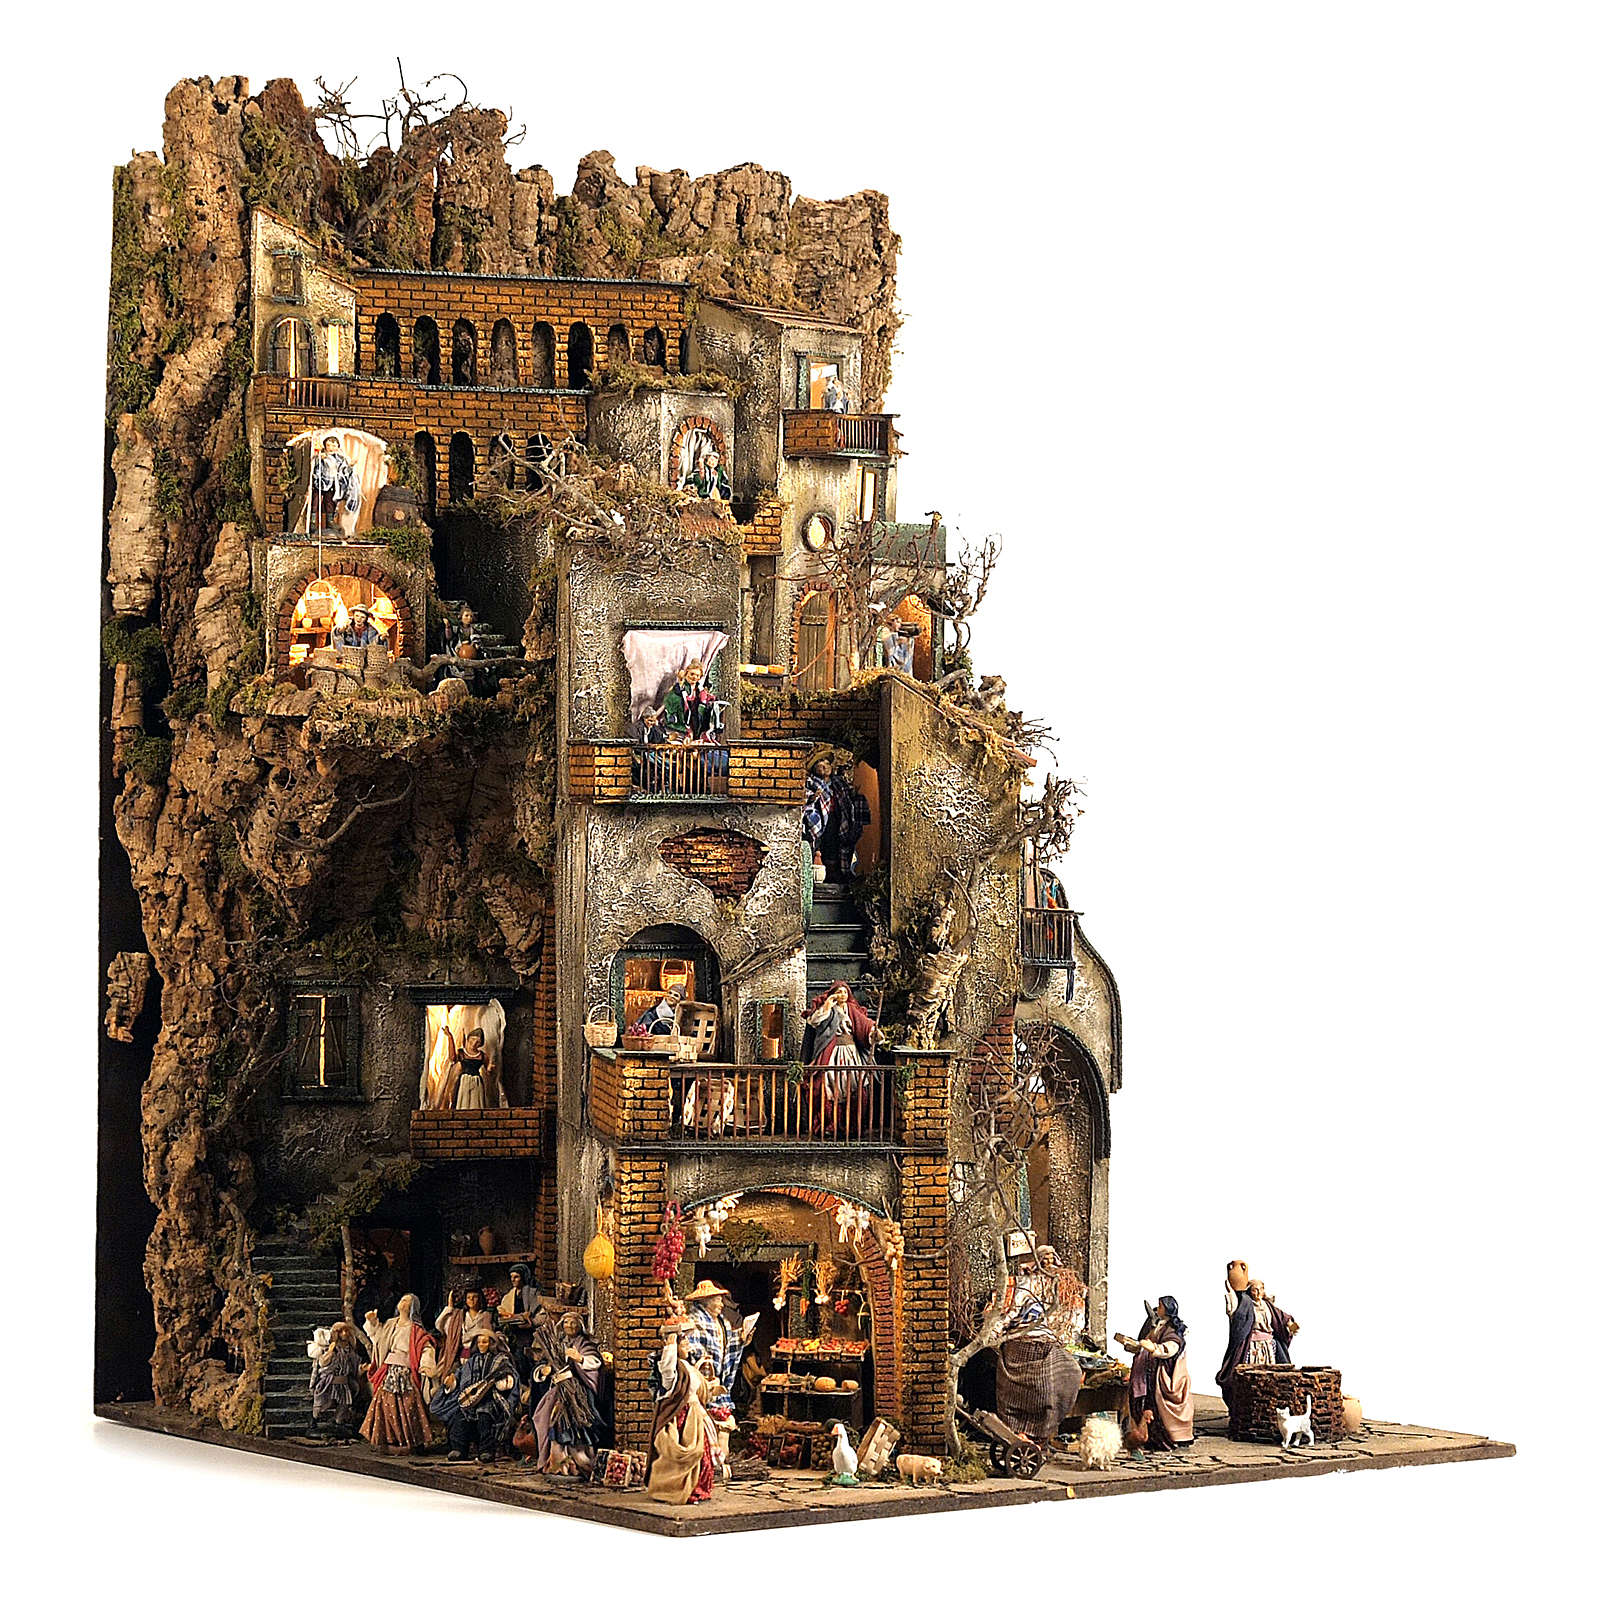 Borgo presepe completo scenografico Napoli 4 mod 120x400x100 cm, 125 past, 20 mov - 14 cm 4